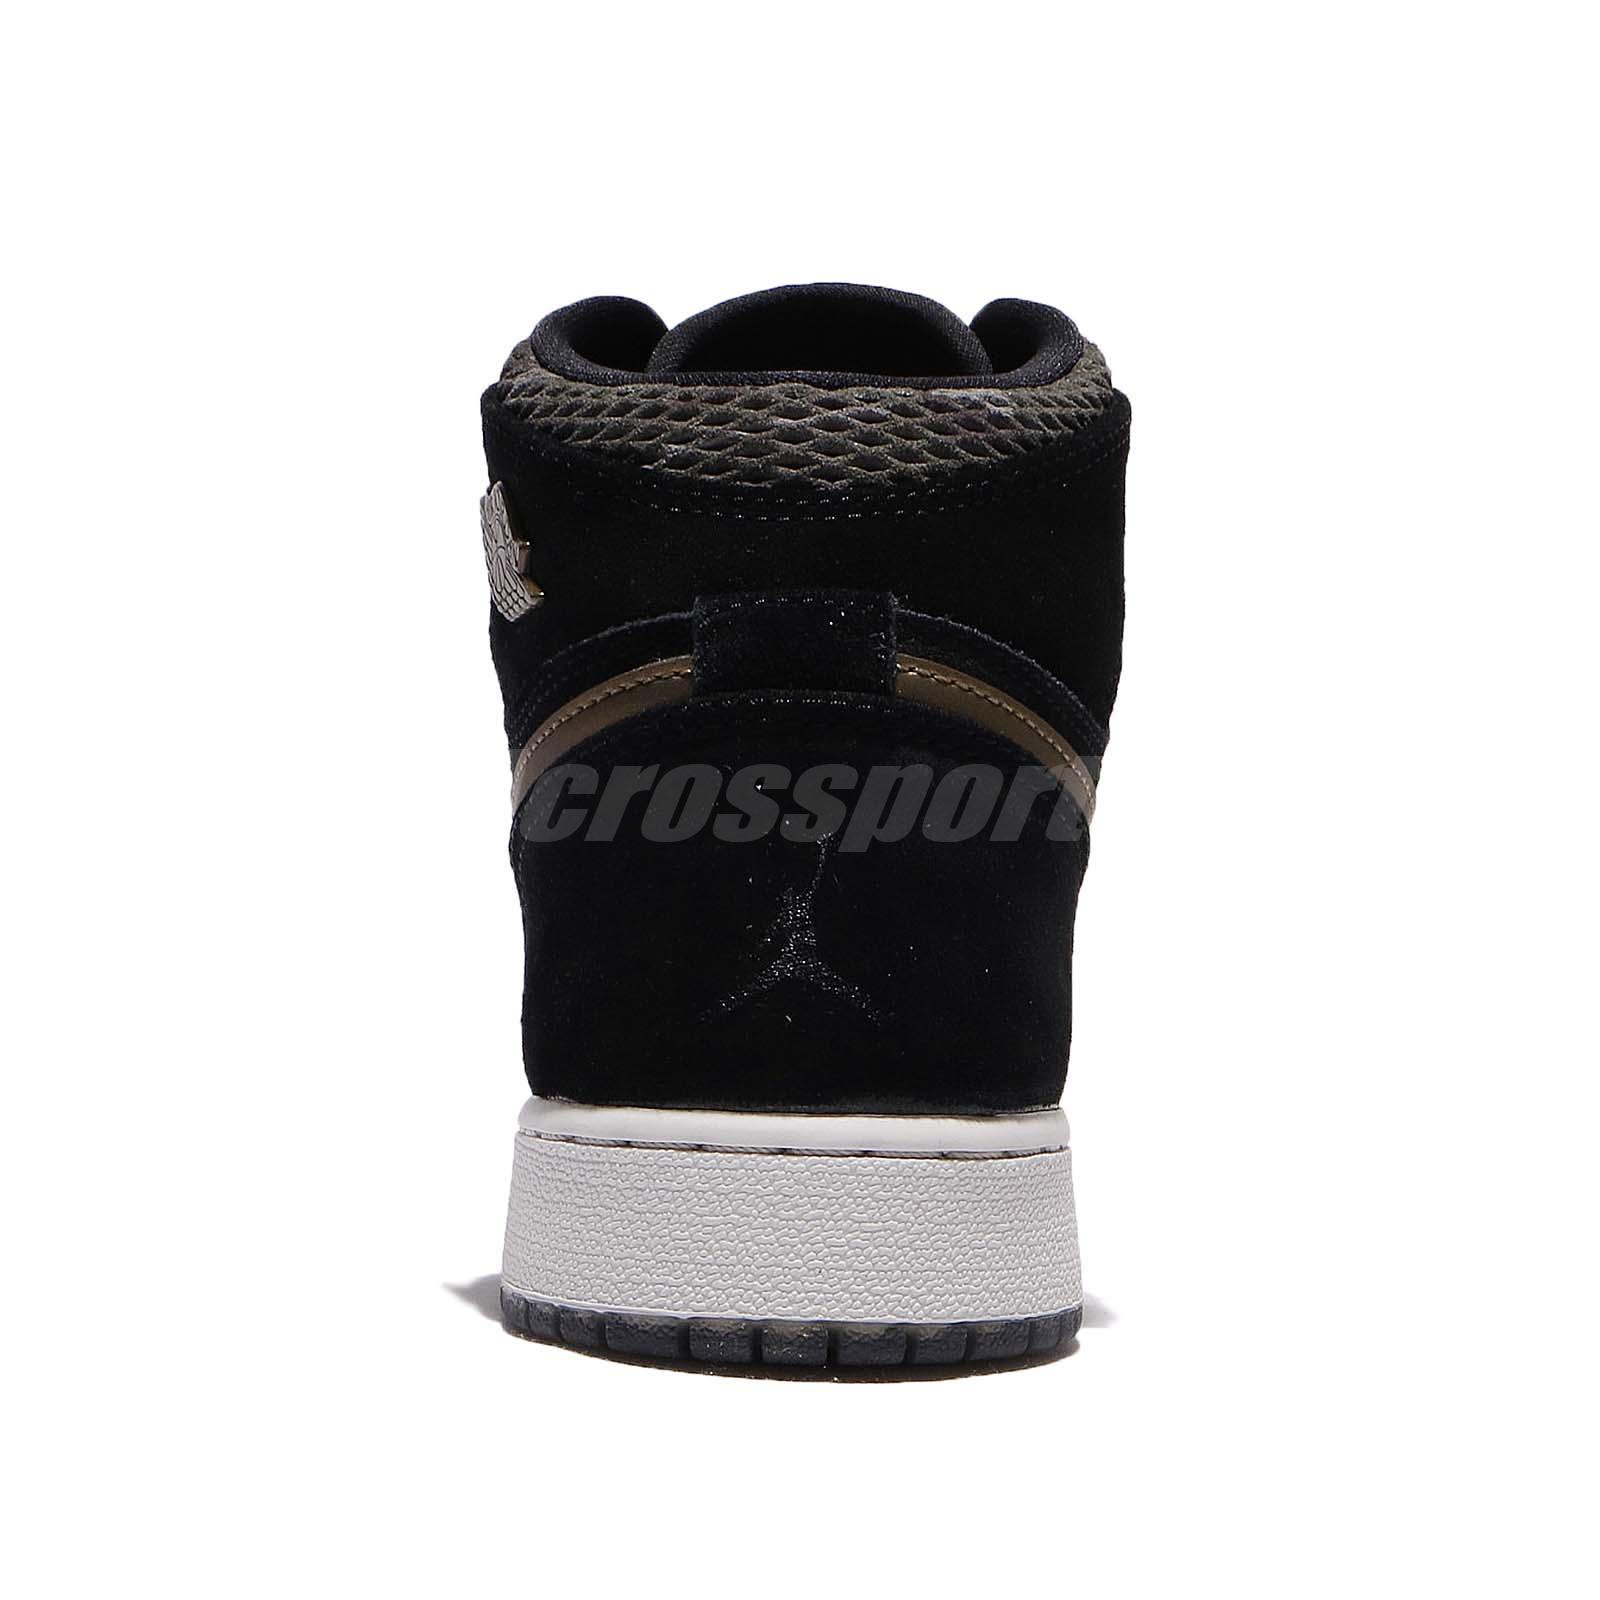 c82848ae409 Nike Air Jordan 1 Retro Hi PREM HC GG Heiress Camo Black Kids Women ...